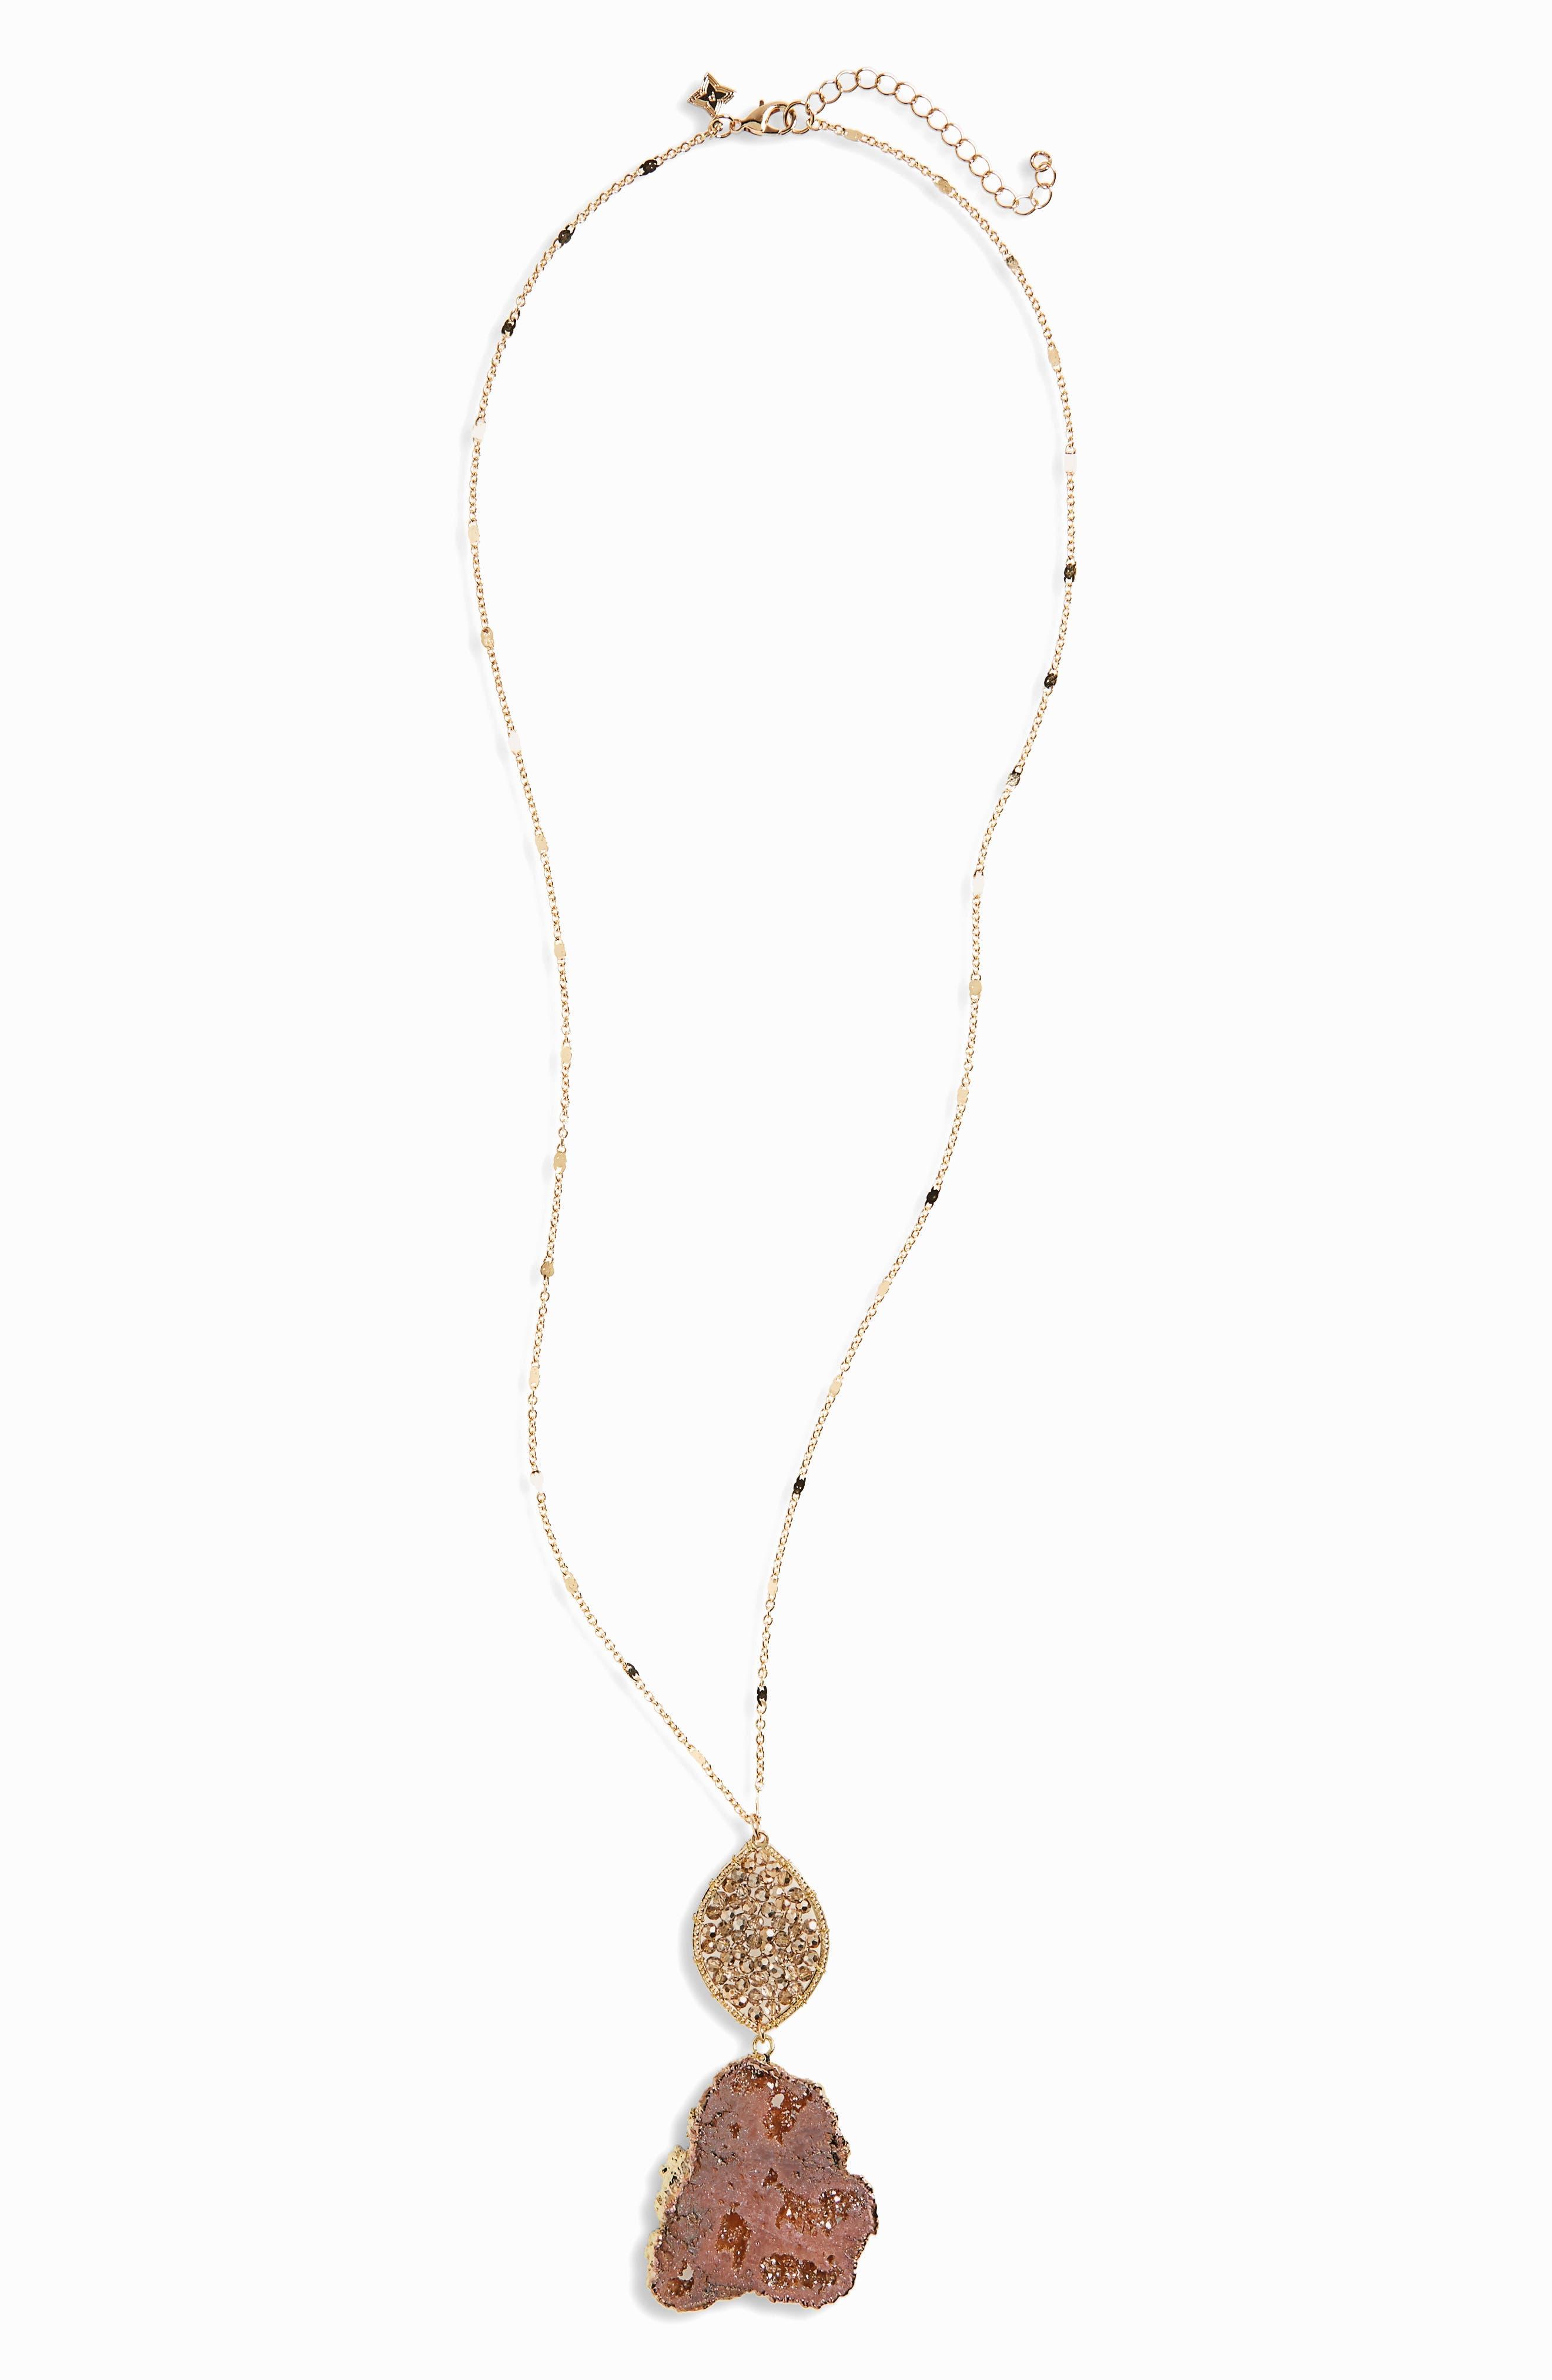 Agate Beaded Pendant Necklace,                             Main thumbnail 1, color,                             950